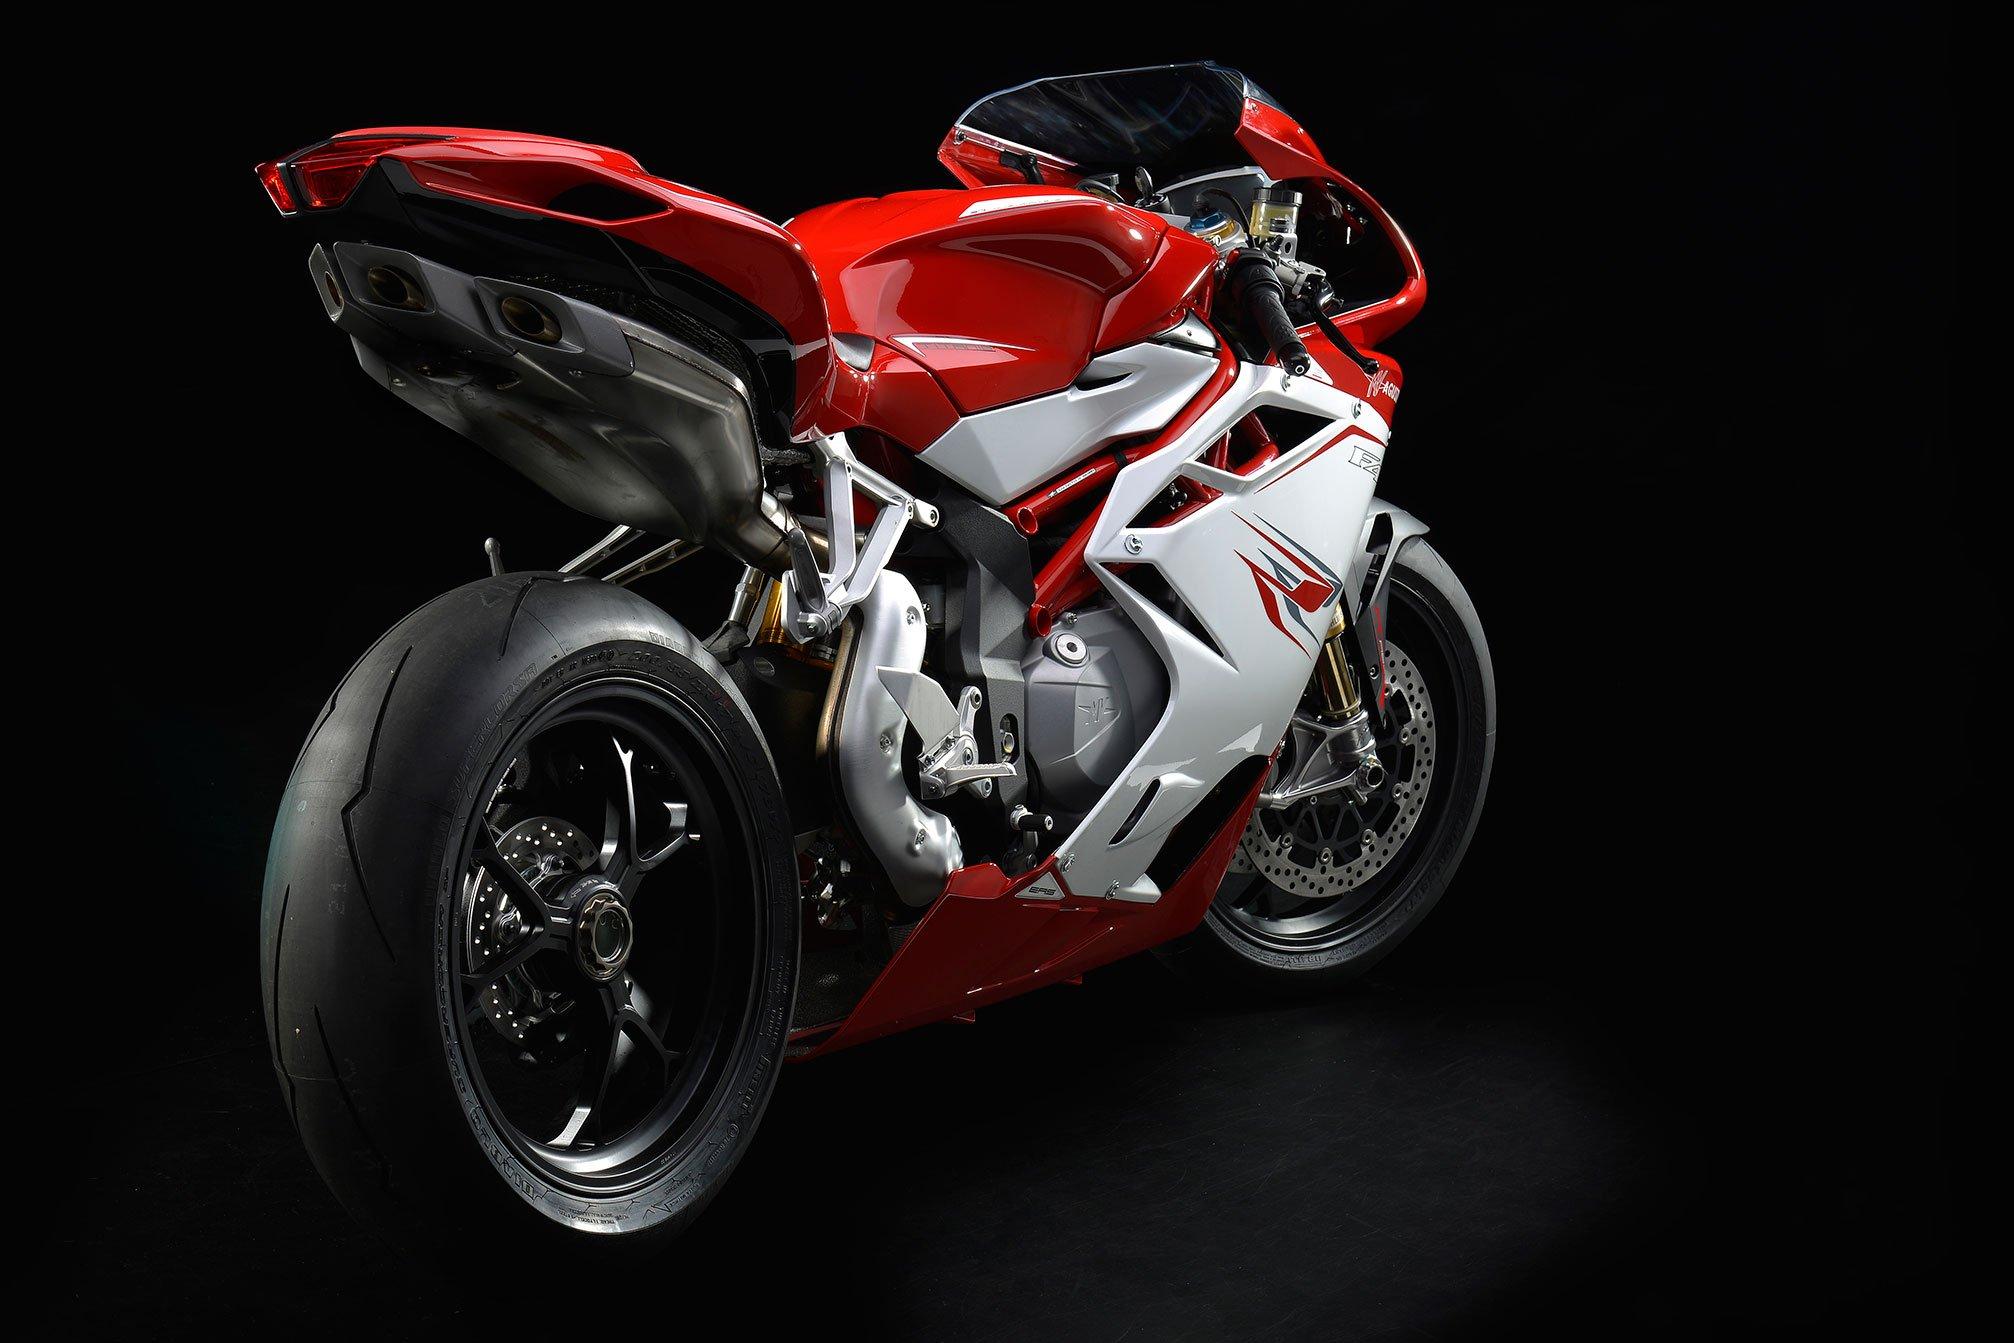 2014 MV-Agusta F4RR Motorbike Bike G Wallpaper